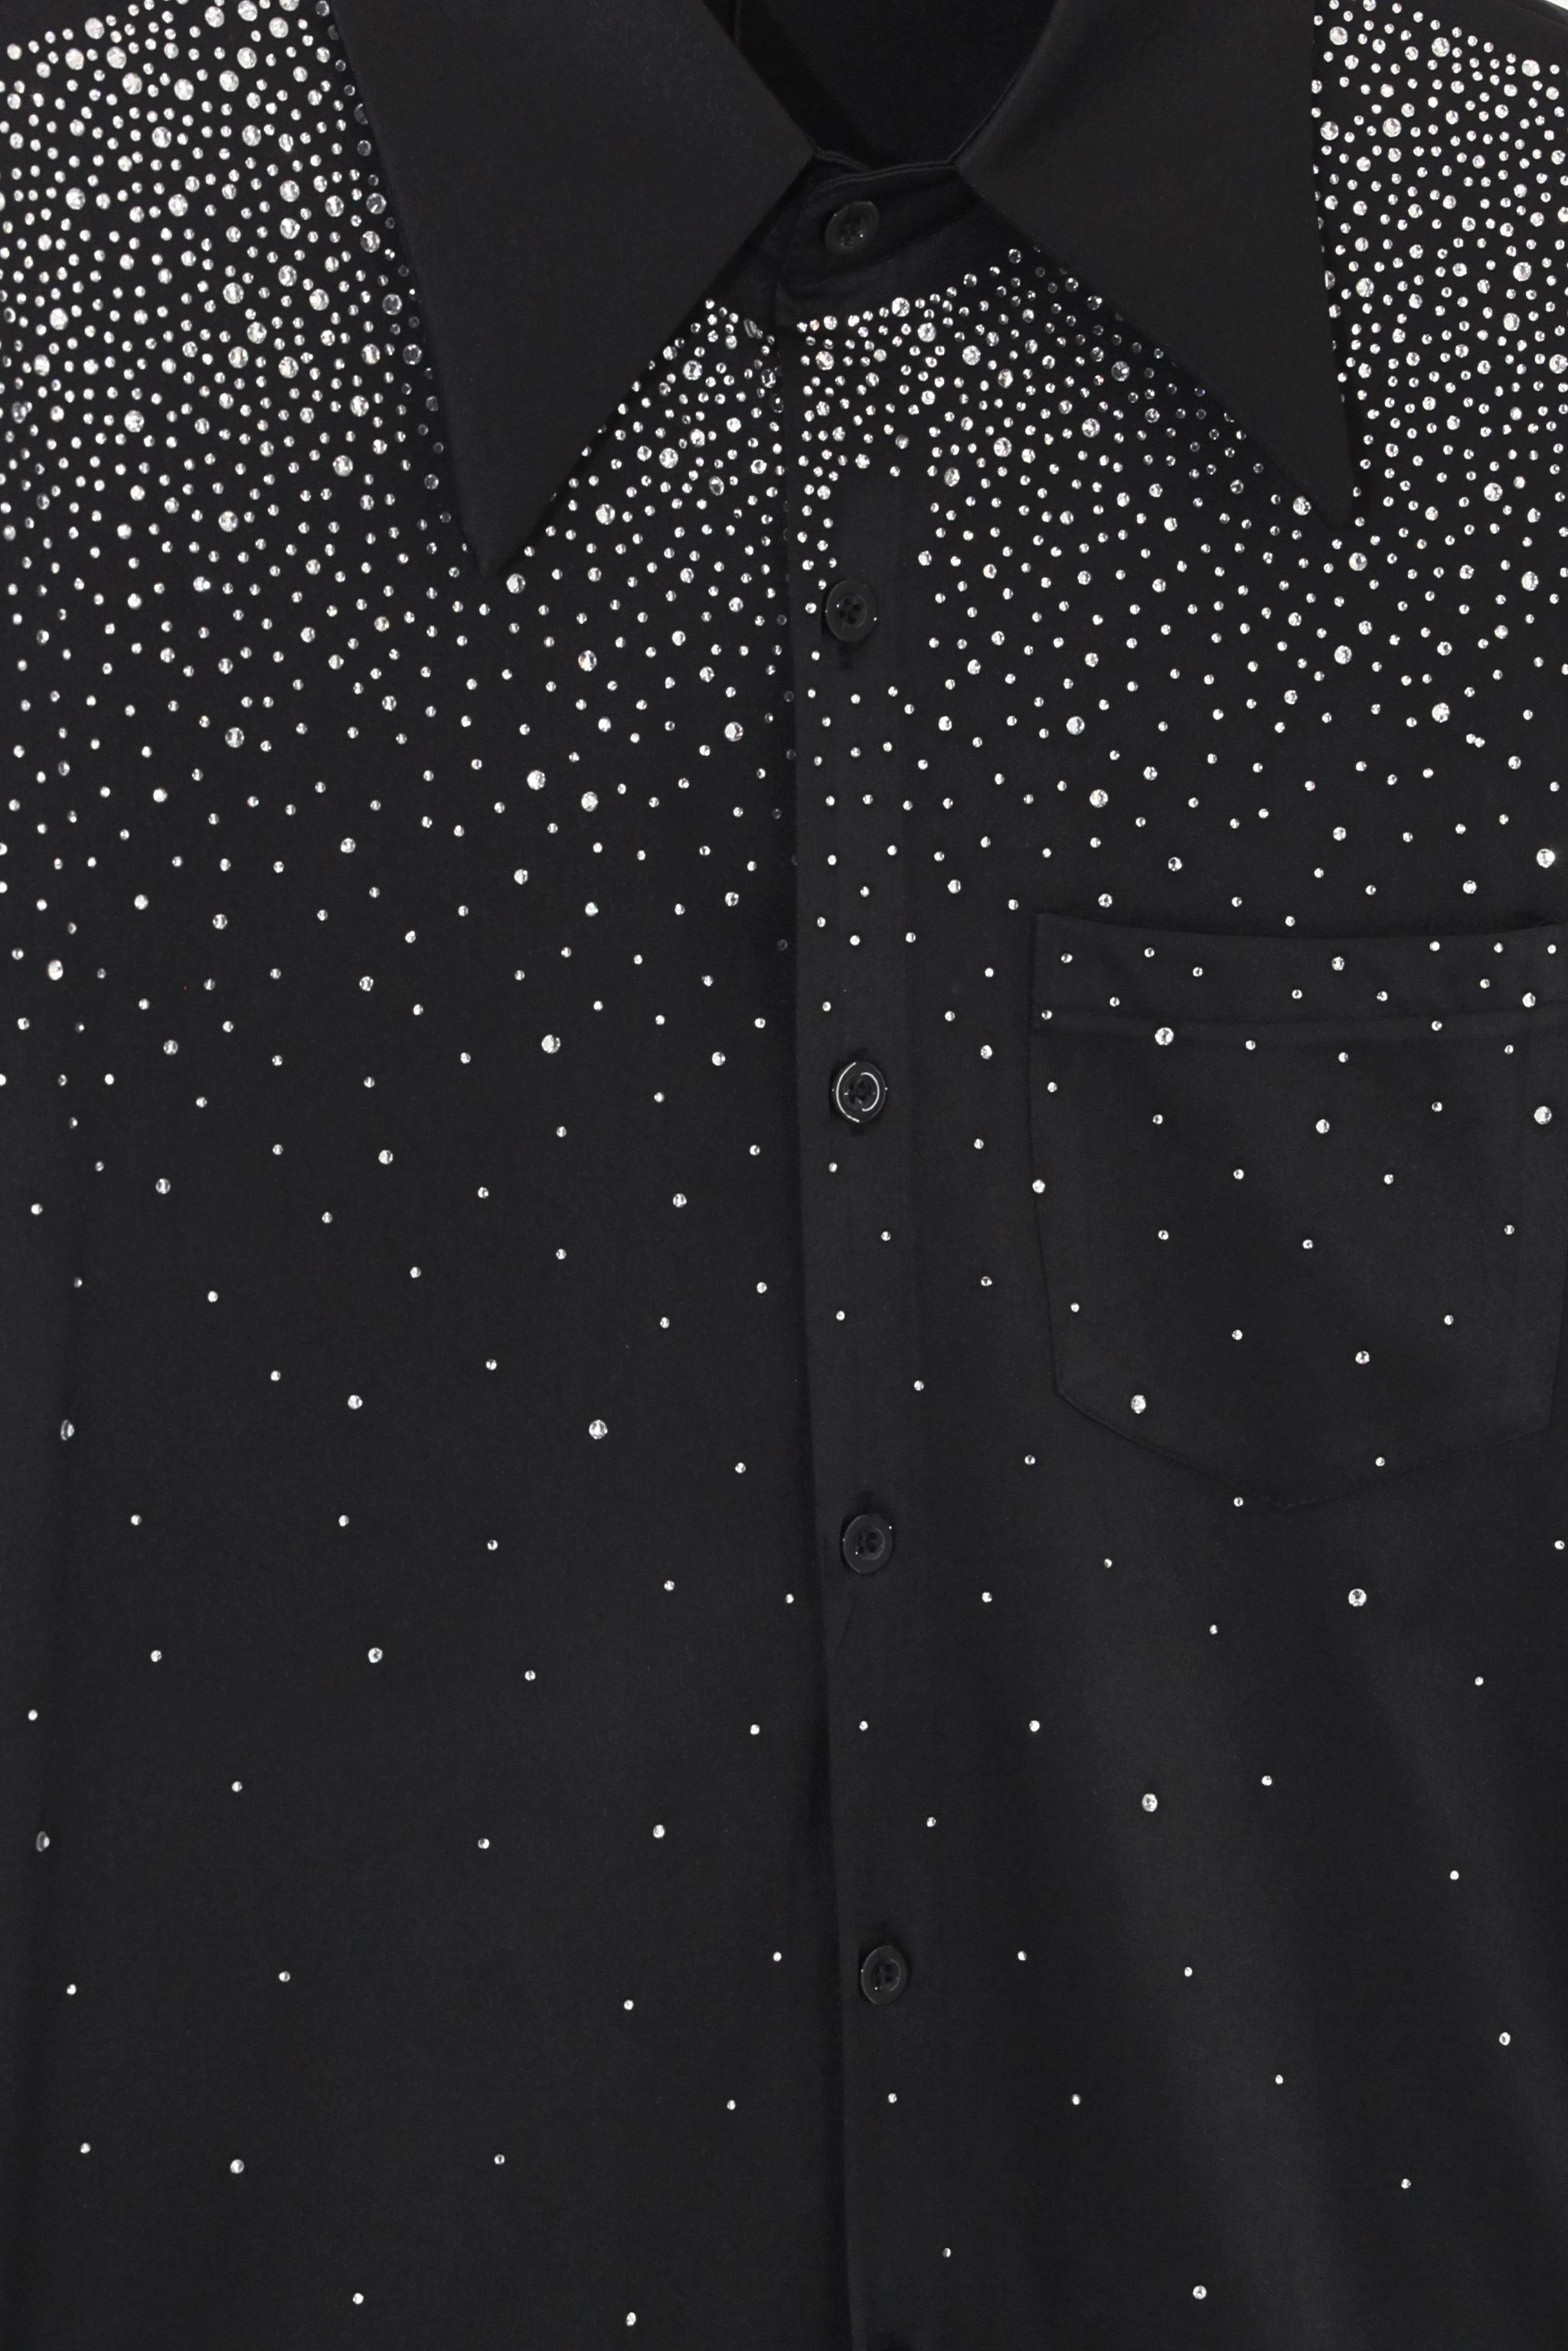 The Earth Print Black Oversized T-shirt